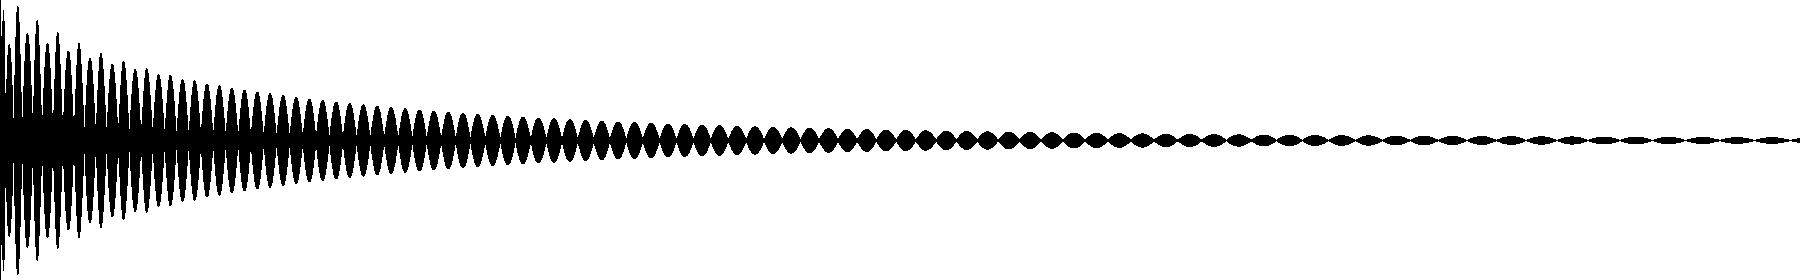 808 bd 2